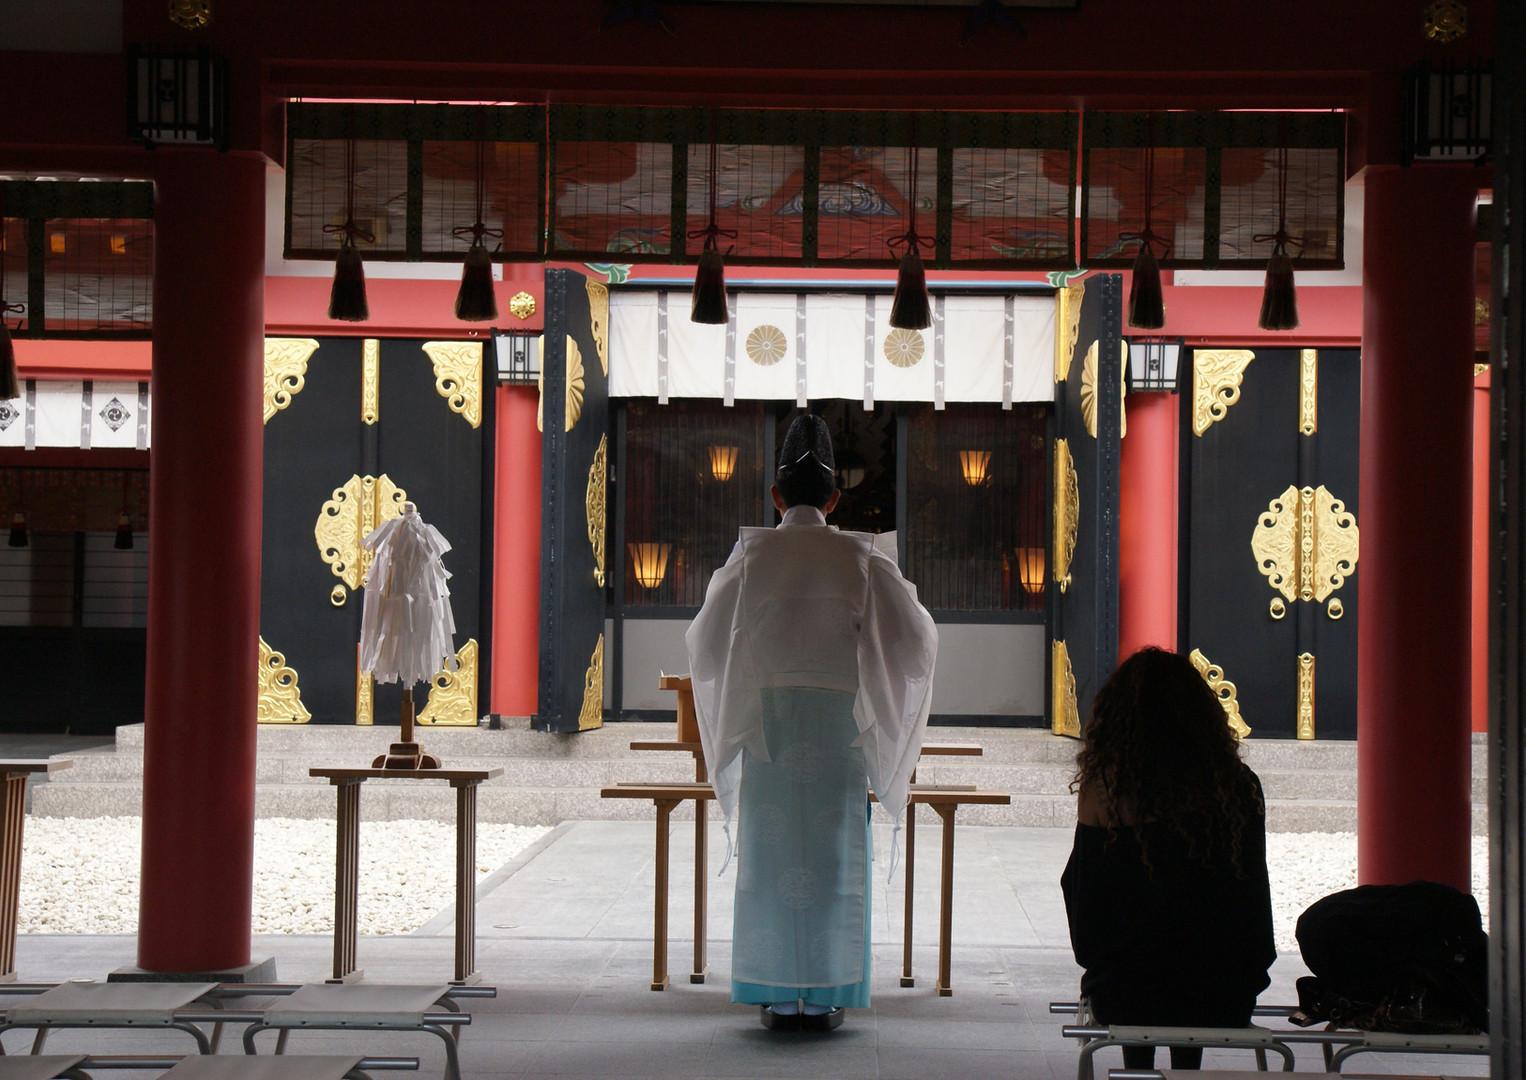 Cerimonia del tempio giapponese